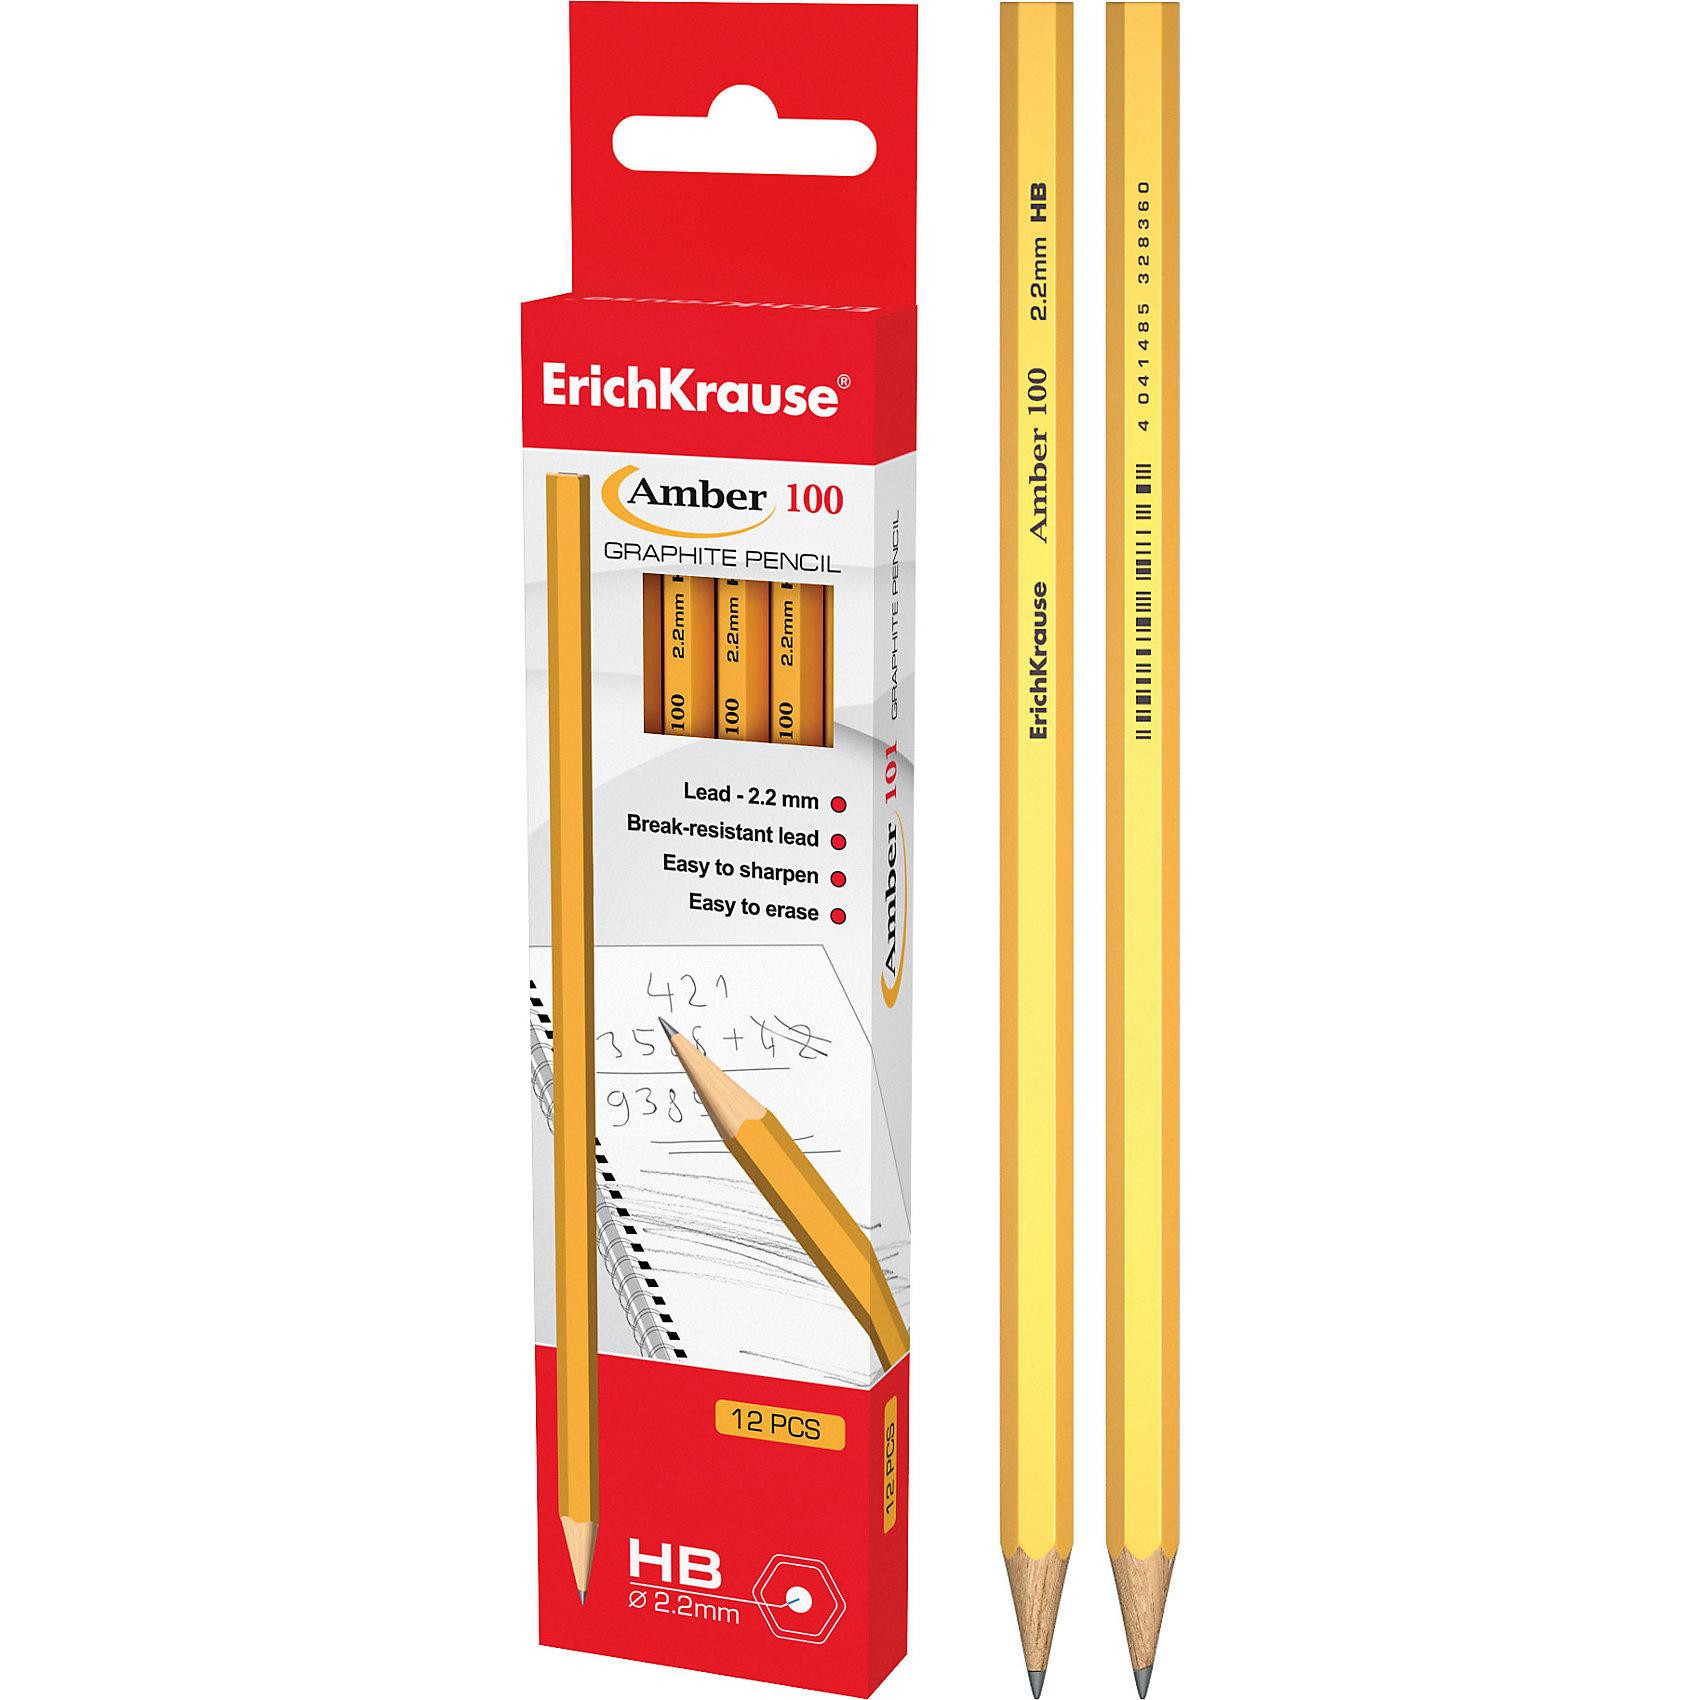 Чернографитный карандаш AMBER 100 (HB) шестигранный, 12 шт., Erich Krauseшестигранный карандаш, HB<br><br>Ширина мм: 45<br>Глубина мм: 220<br>Высота мм: 150<br>Вес г: 120<br>Возраст от месяцев: 84<br>Возраст до месяцев: 2147483647<br>Пол: Унисекс<br>Возраст: Детский<br>SKU: 5543303